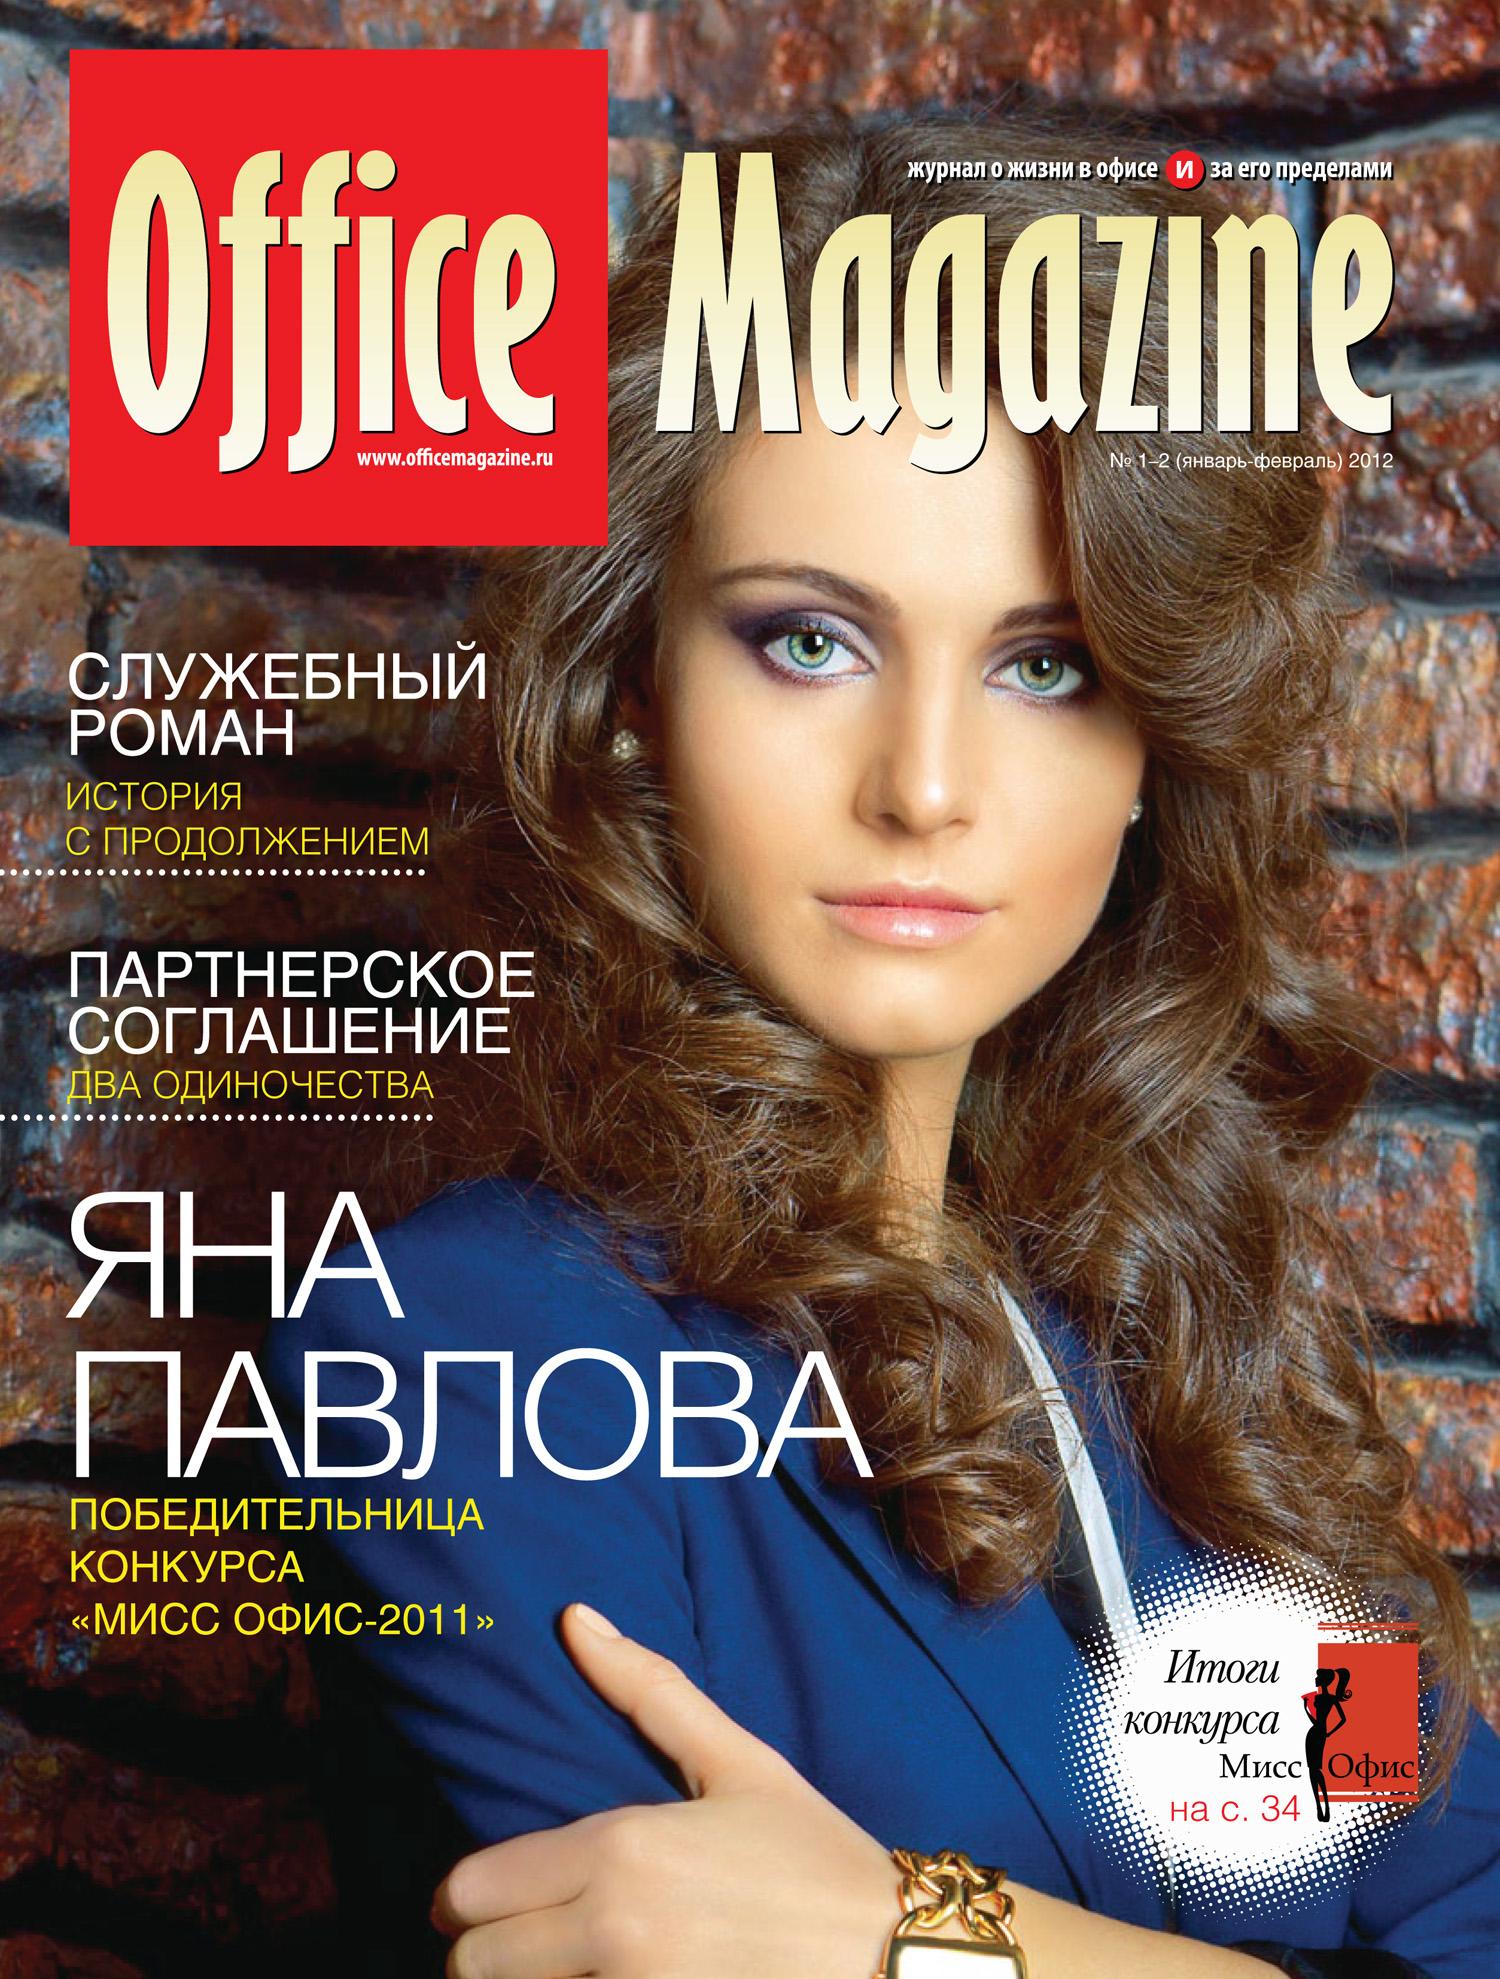 Office Magazine №1-2 (57) январь-февраль 2012